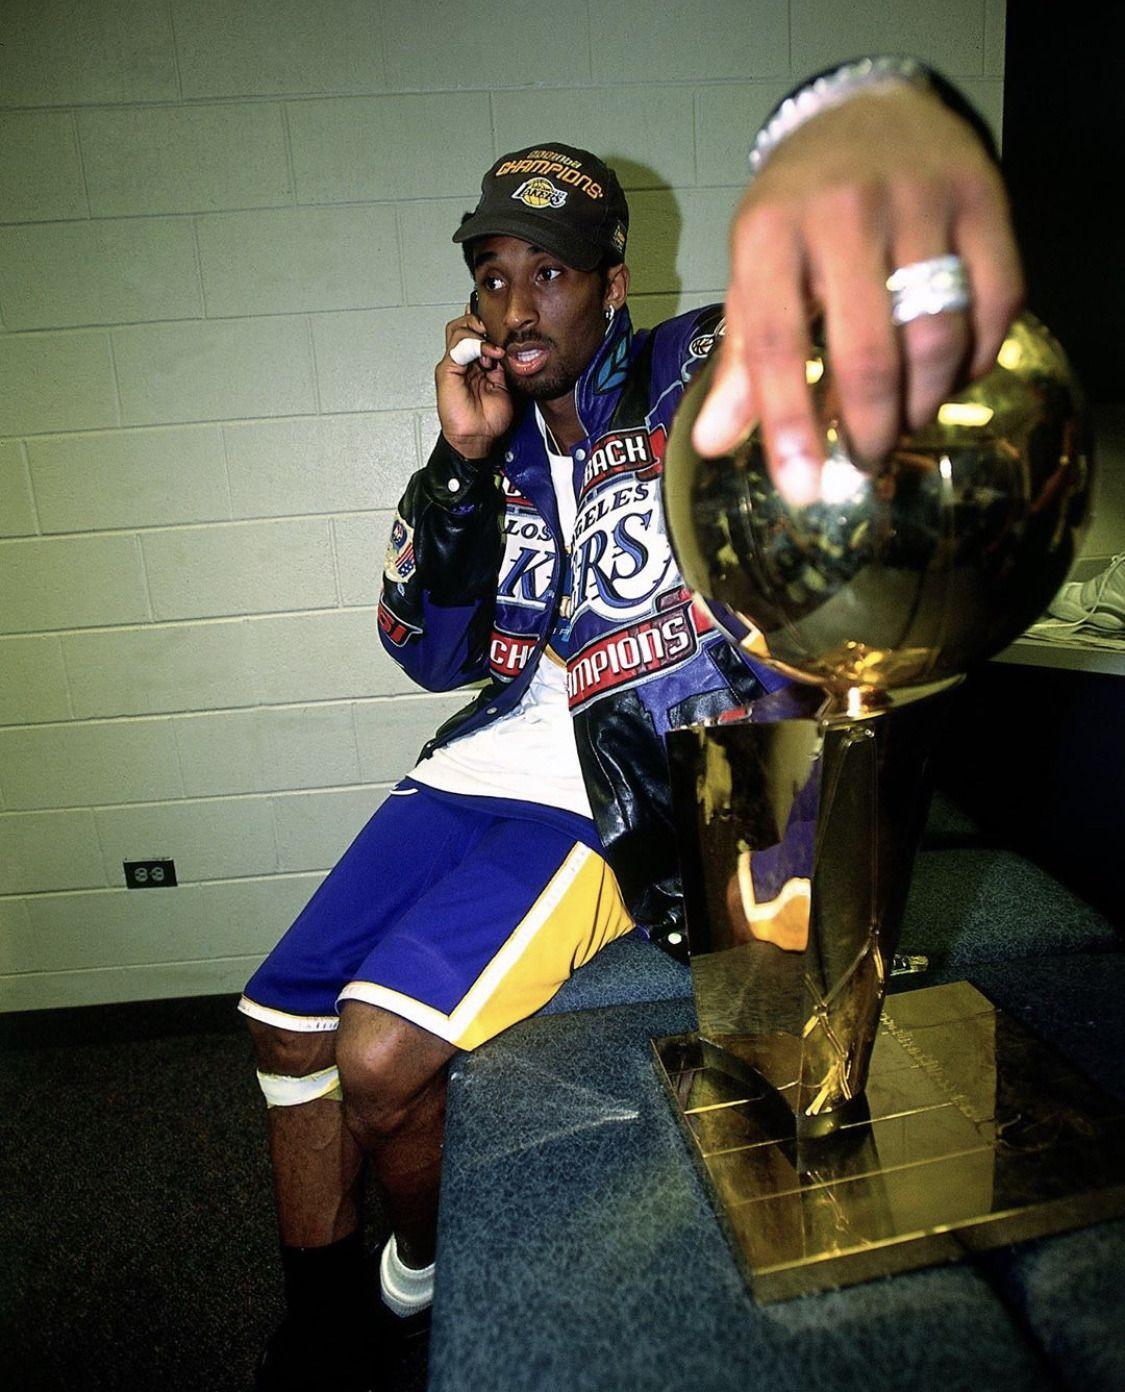 Nba Finals Archive Kobe Bryant 2001 Nba Finals In 2020 Kobe Bryant Wallpaper Kobe Bryant Pictures Kobe Bryant